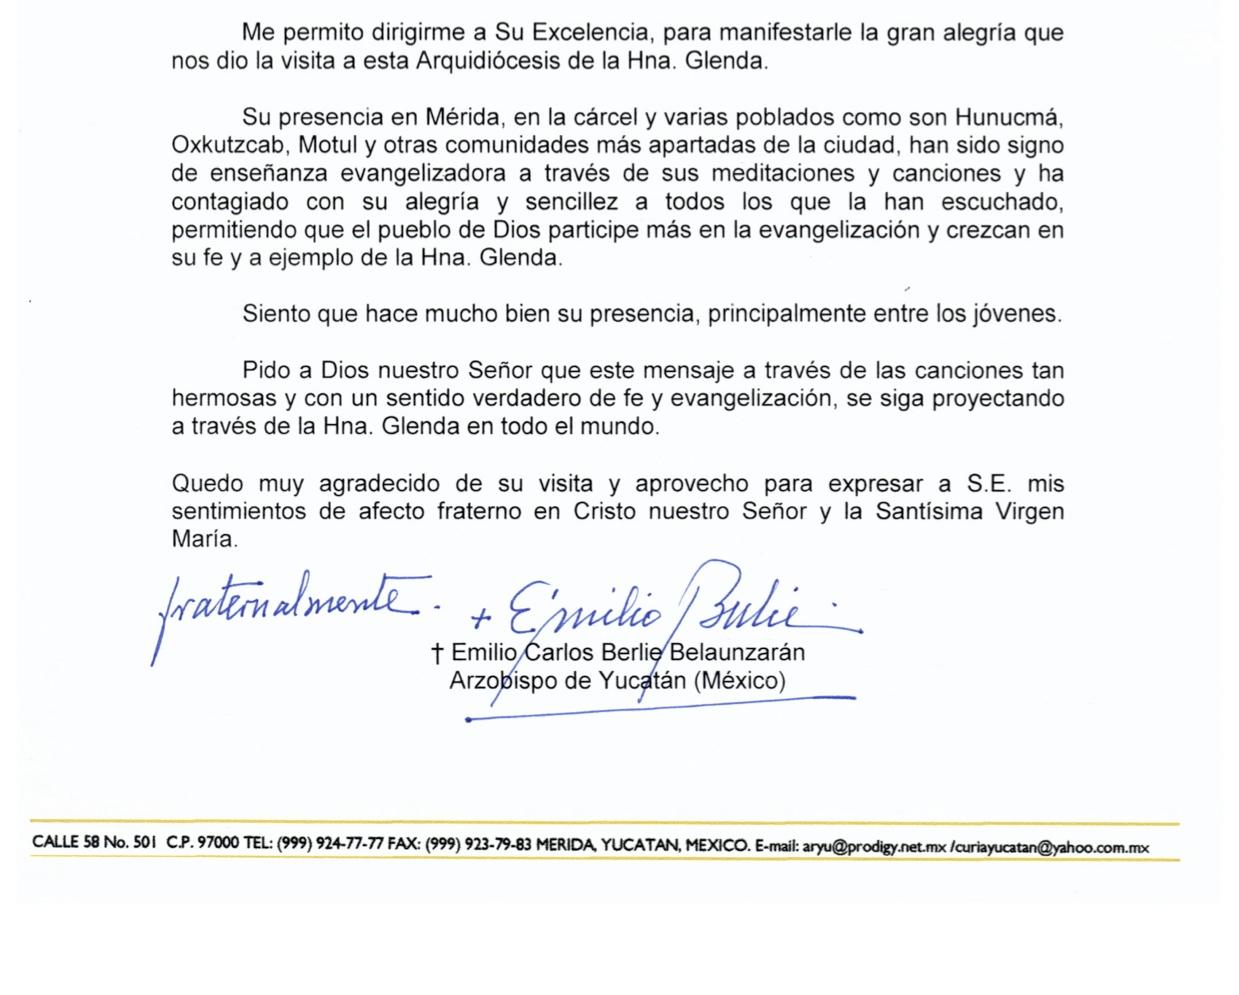 ARZOBISPO DE MERIDA, MEXICO